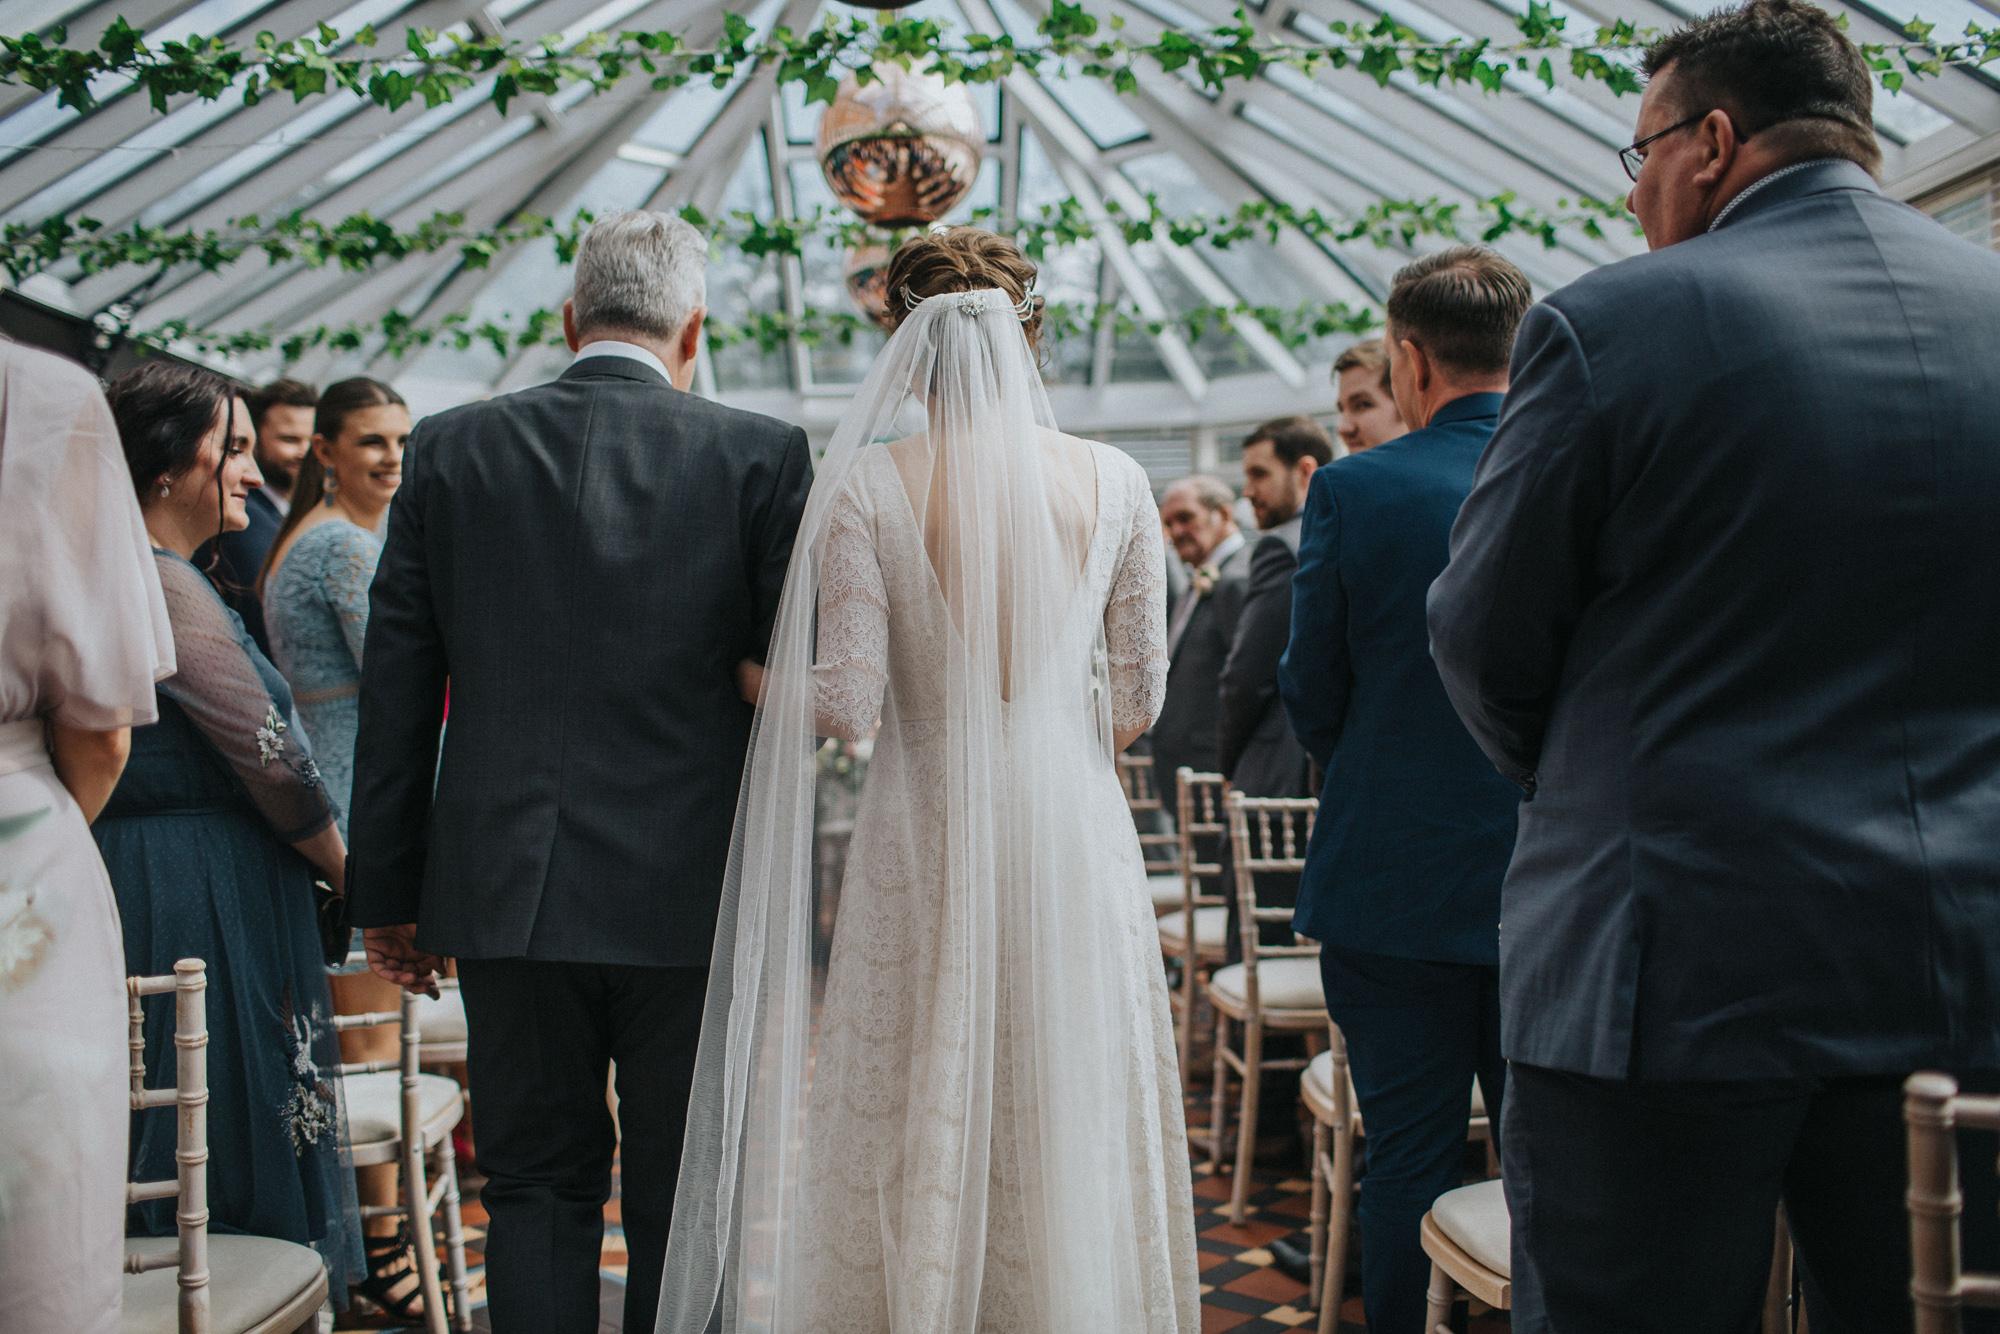 Kate-Beaumont-Lace-Flared-Dahlia-Gown-Leeds-Wedding-Bloom-Weddings-15.jpg